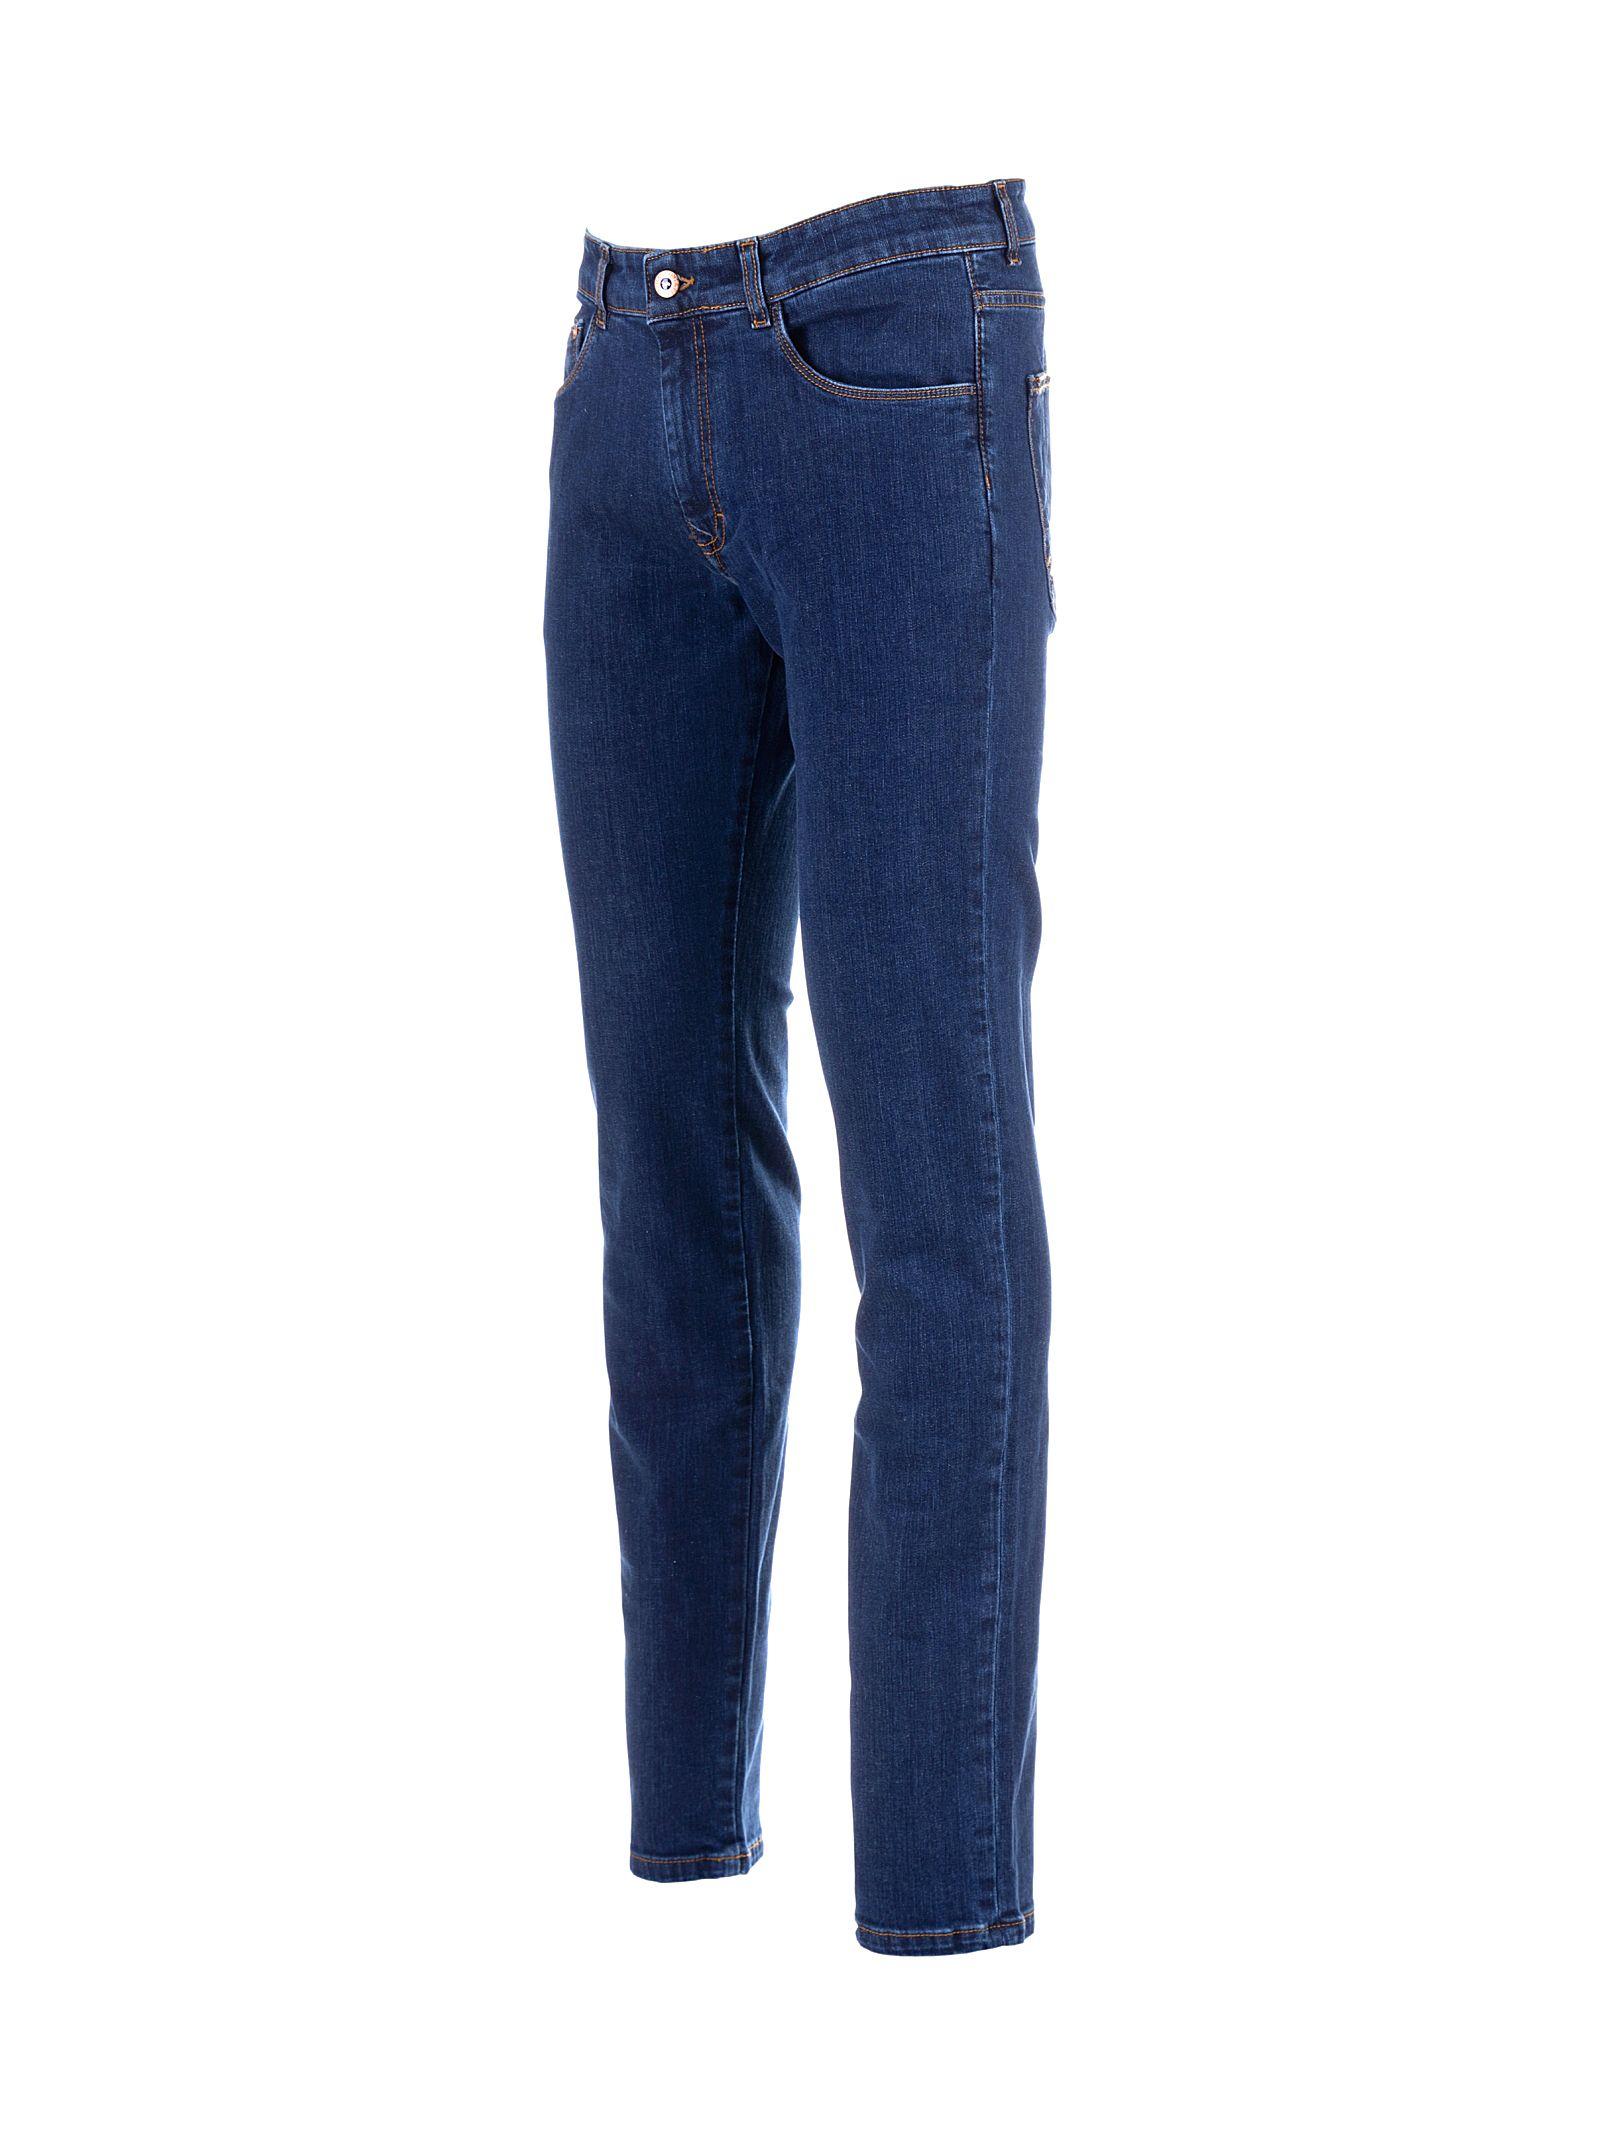 Harmont & Blaine Jeans WNF007 059425